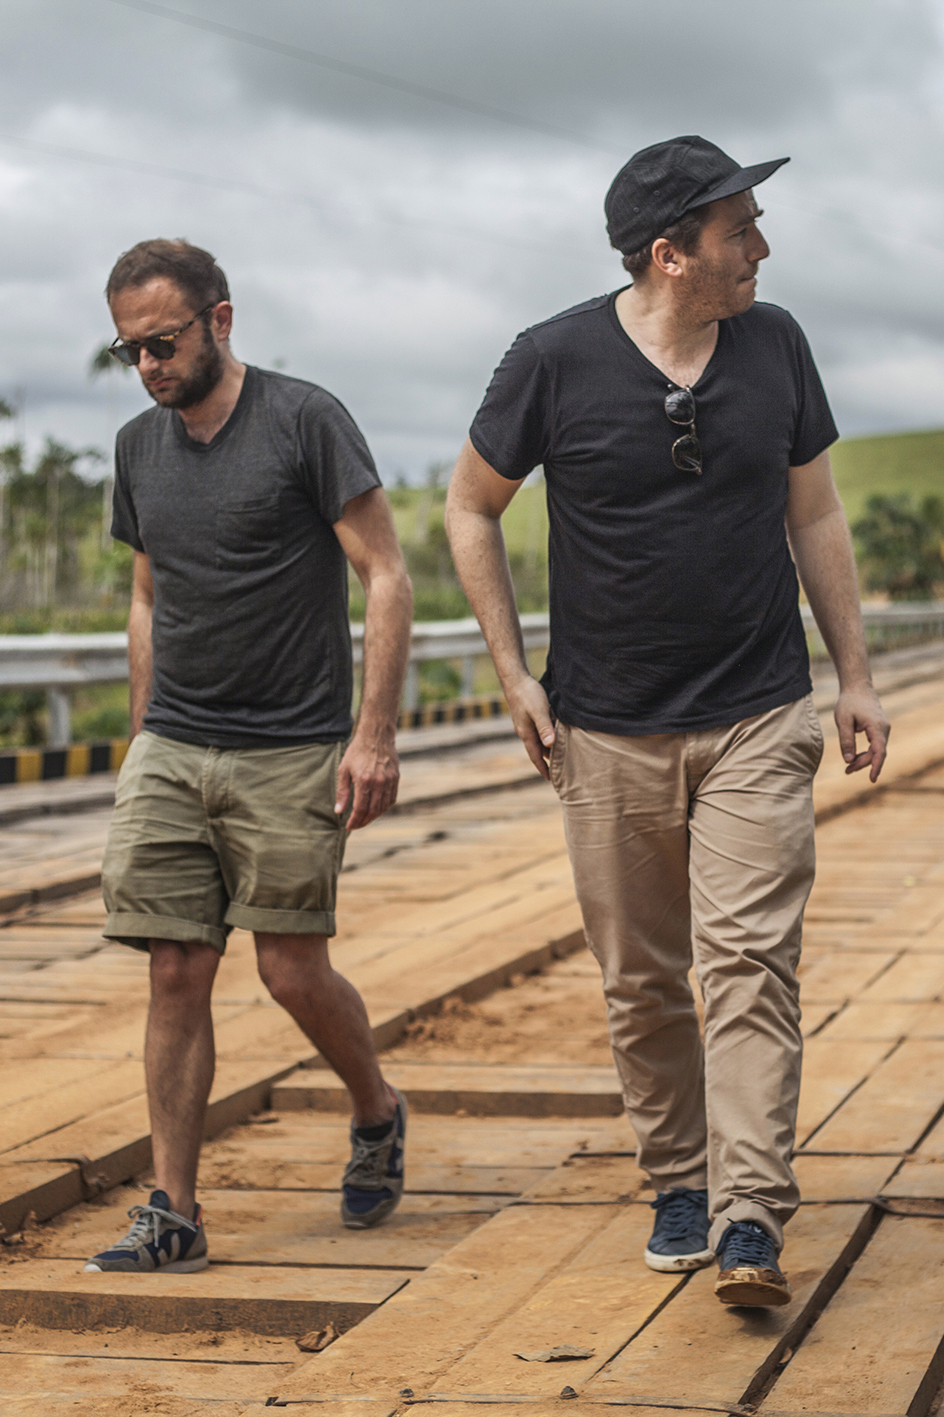 S.Kopp-and-G.Morillion-in-Amazonia_2.jpg